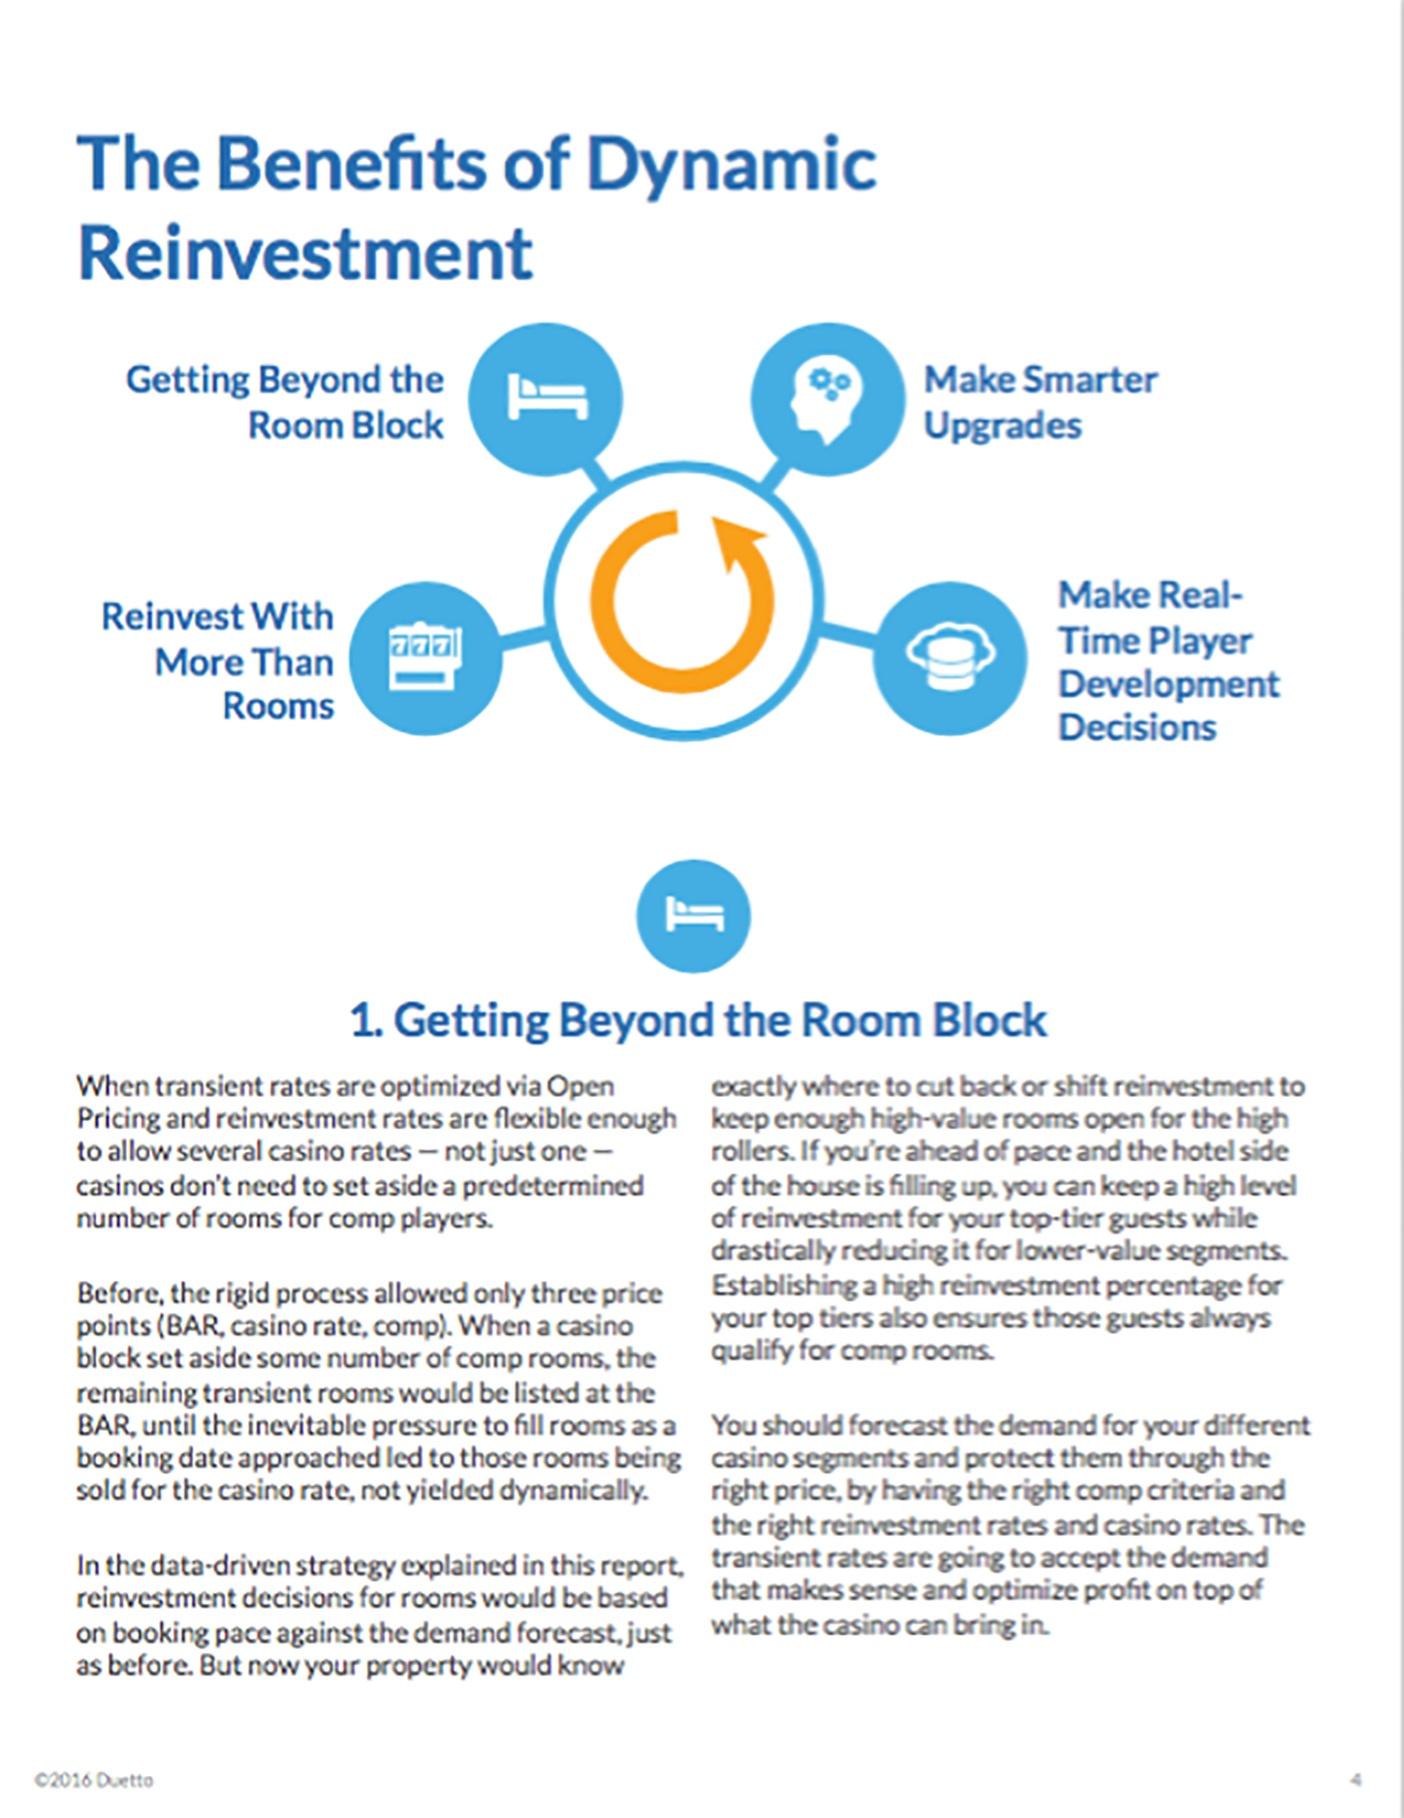 WP 4 Ways Dynamic Reinvestment 4.jpg